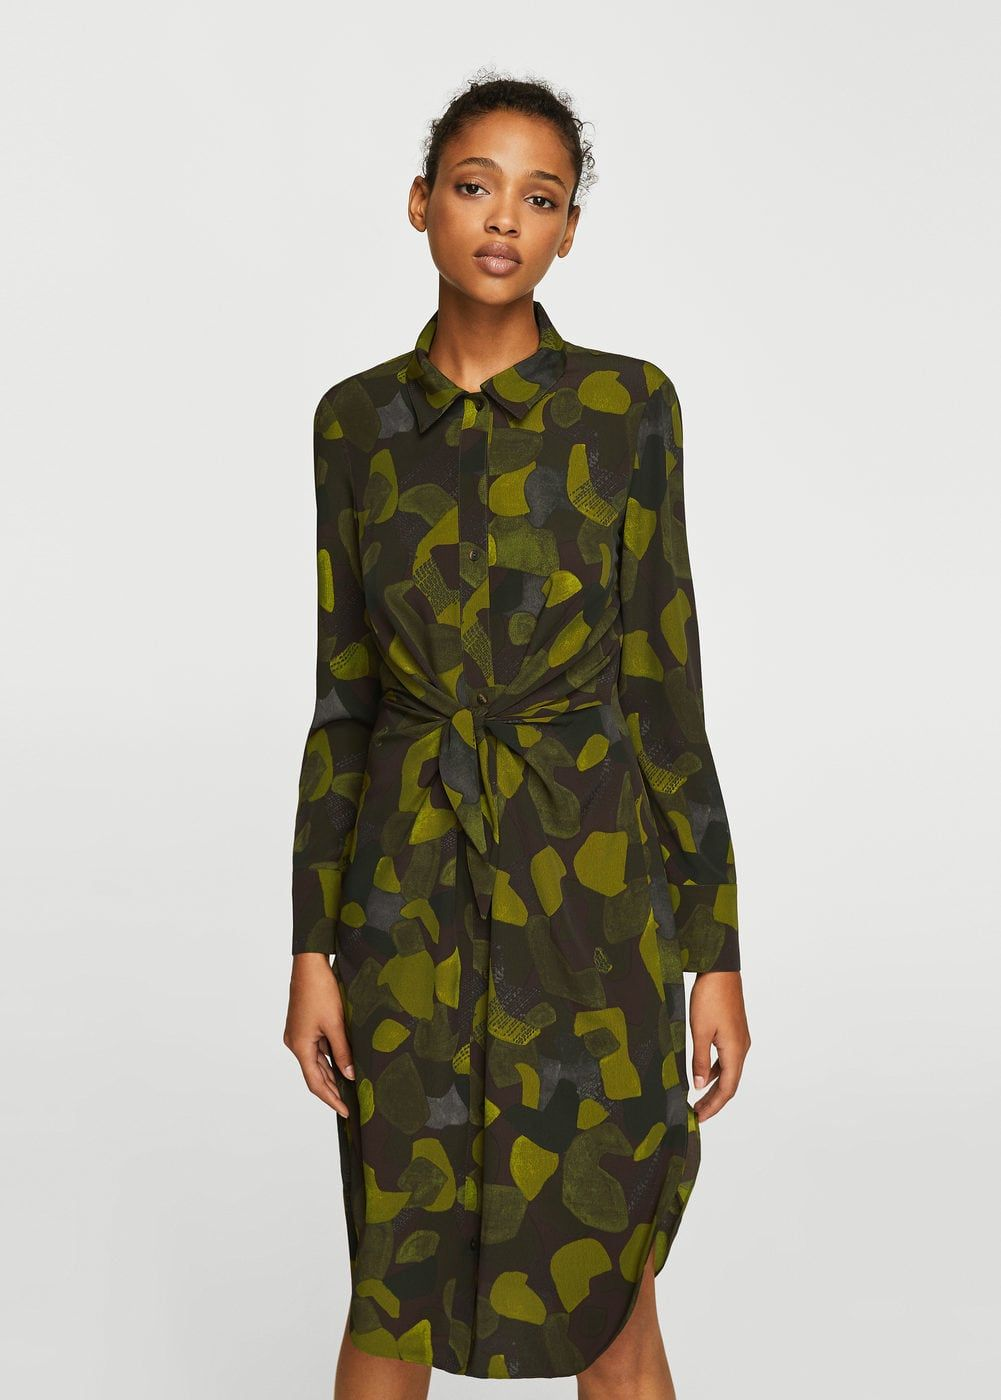 Dresses Print Camo Knot Woman Dress Pinterest More Inspiration And wPfB1q1n